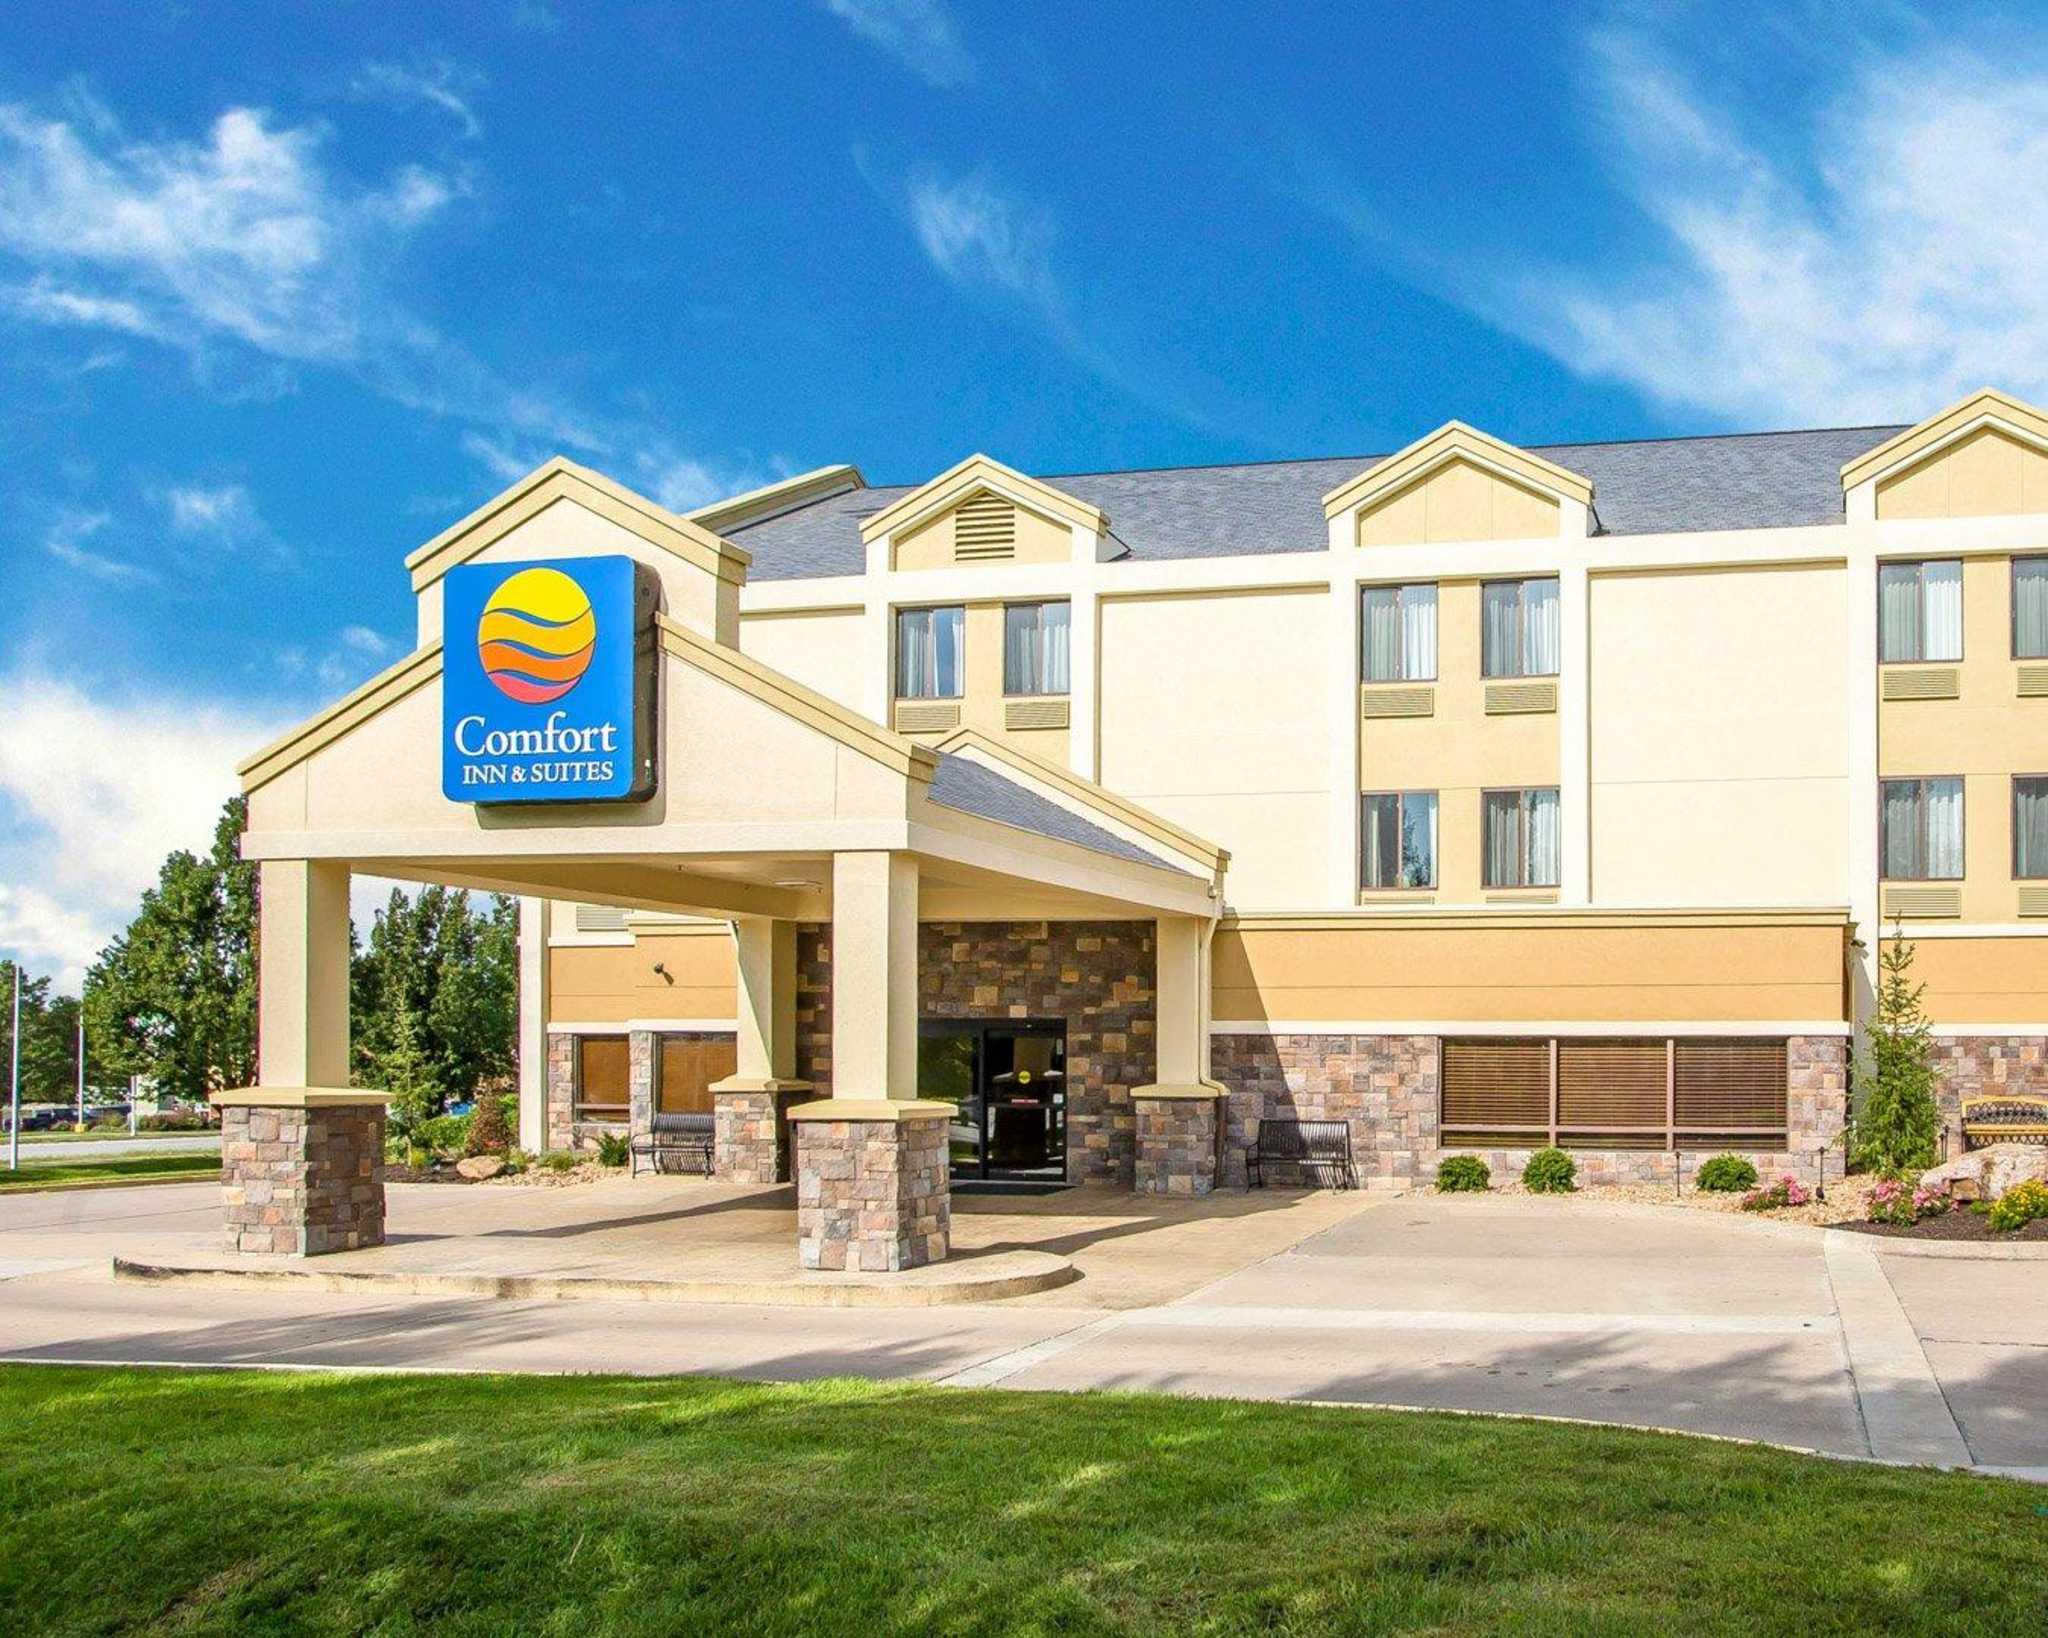 Comfort Inn & Suites Kansas City - Northeast image 1